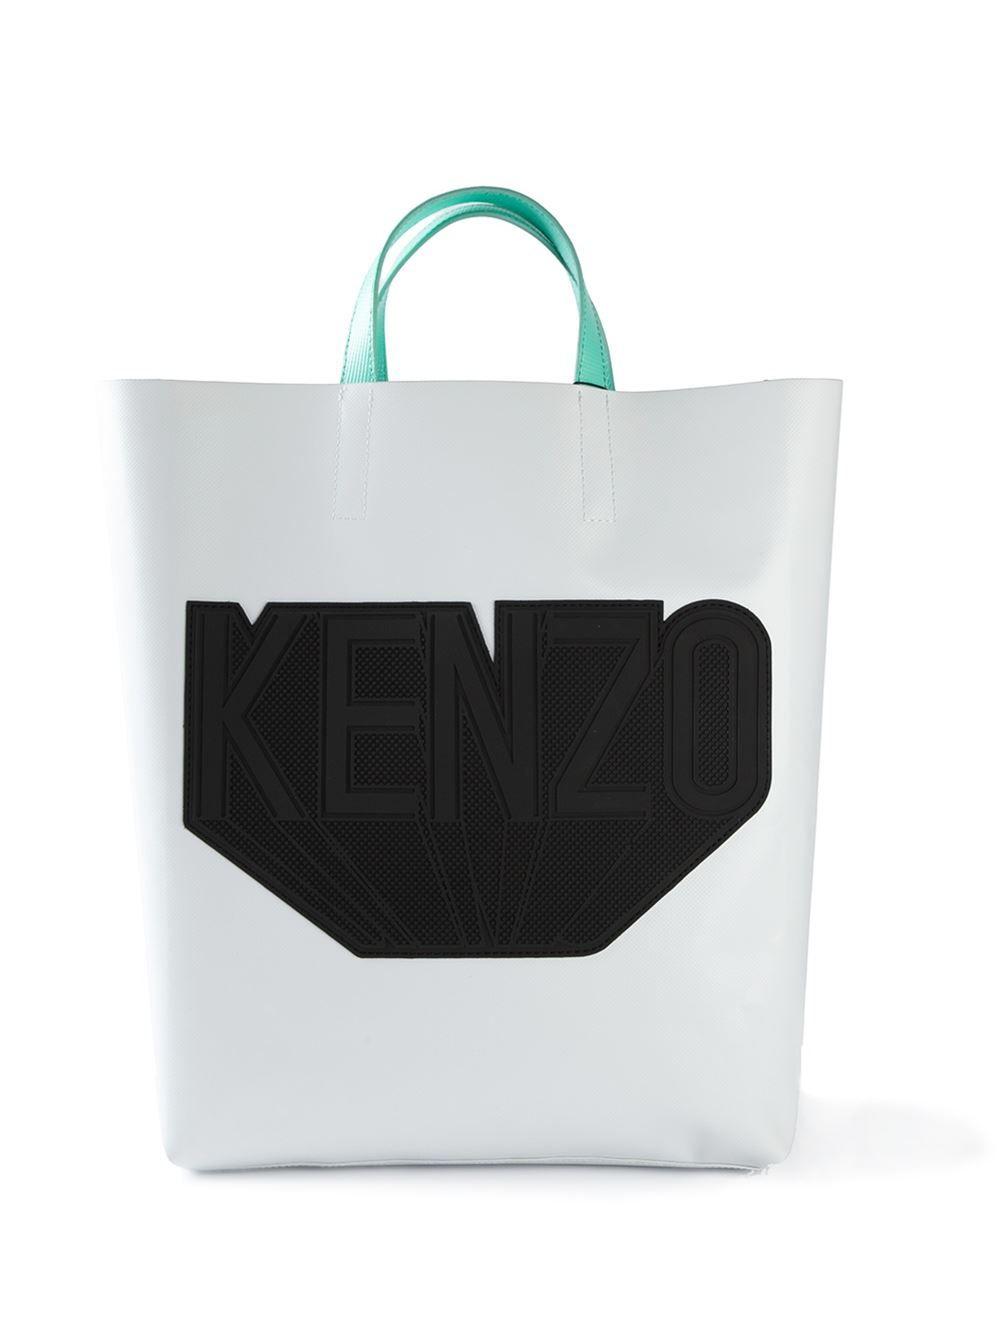 b82565a8 Kenzo Logo Patch Tote - Tom Greyhound - Farfetch.com   Bags ...